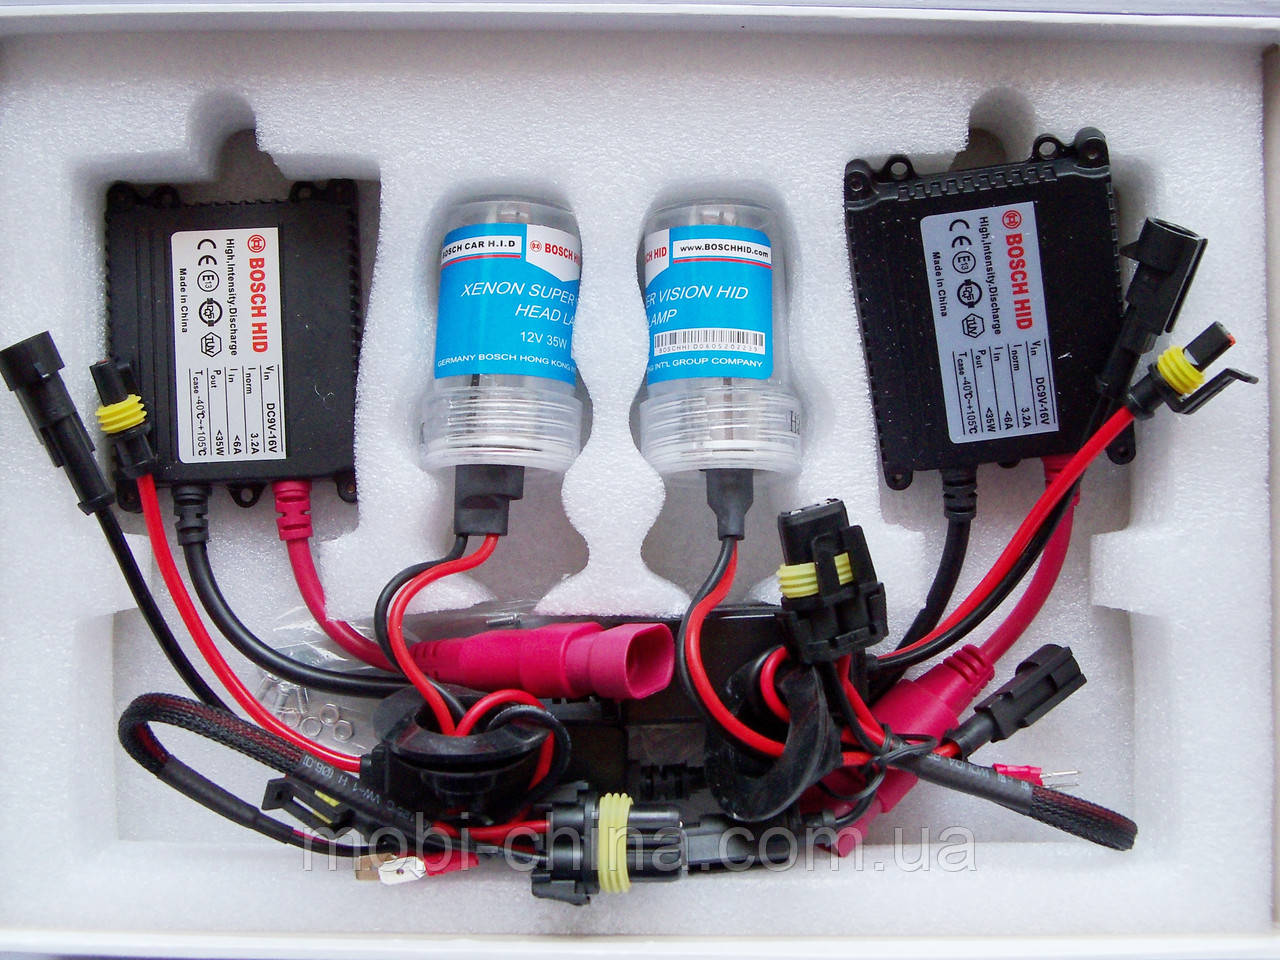 HID XENON H3 (bosch) 5000K/12V/35W - комплект ксеноновых ламп для автомобиля